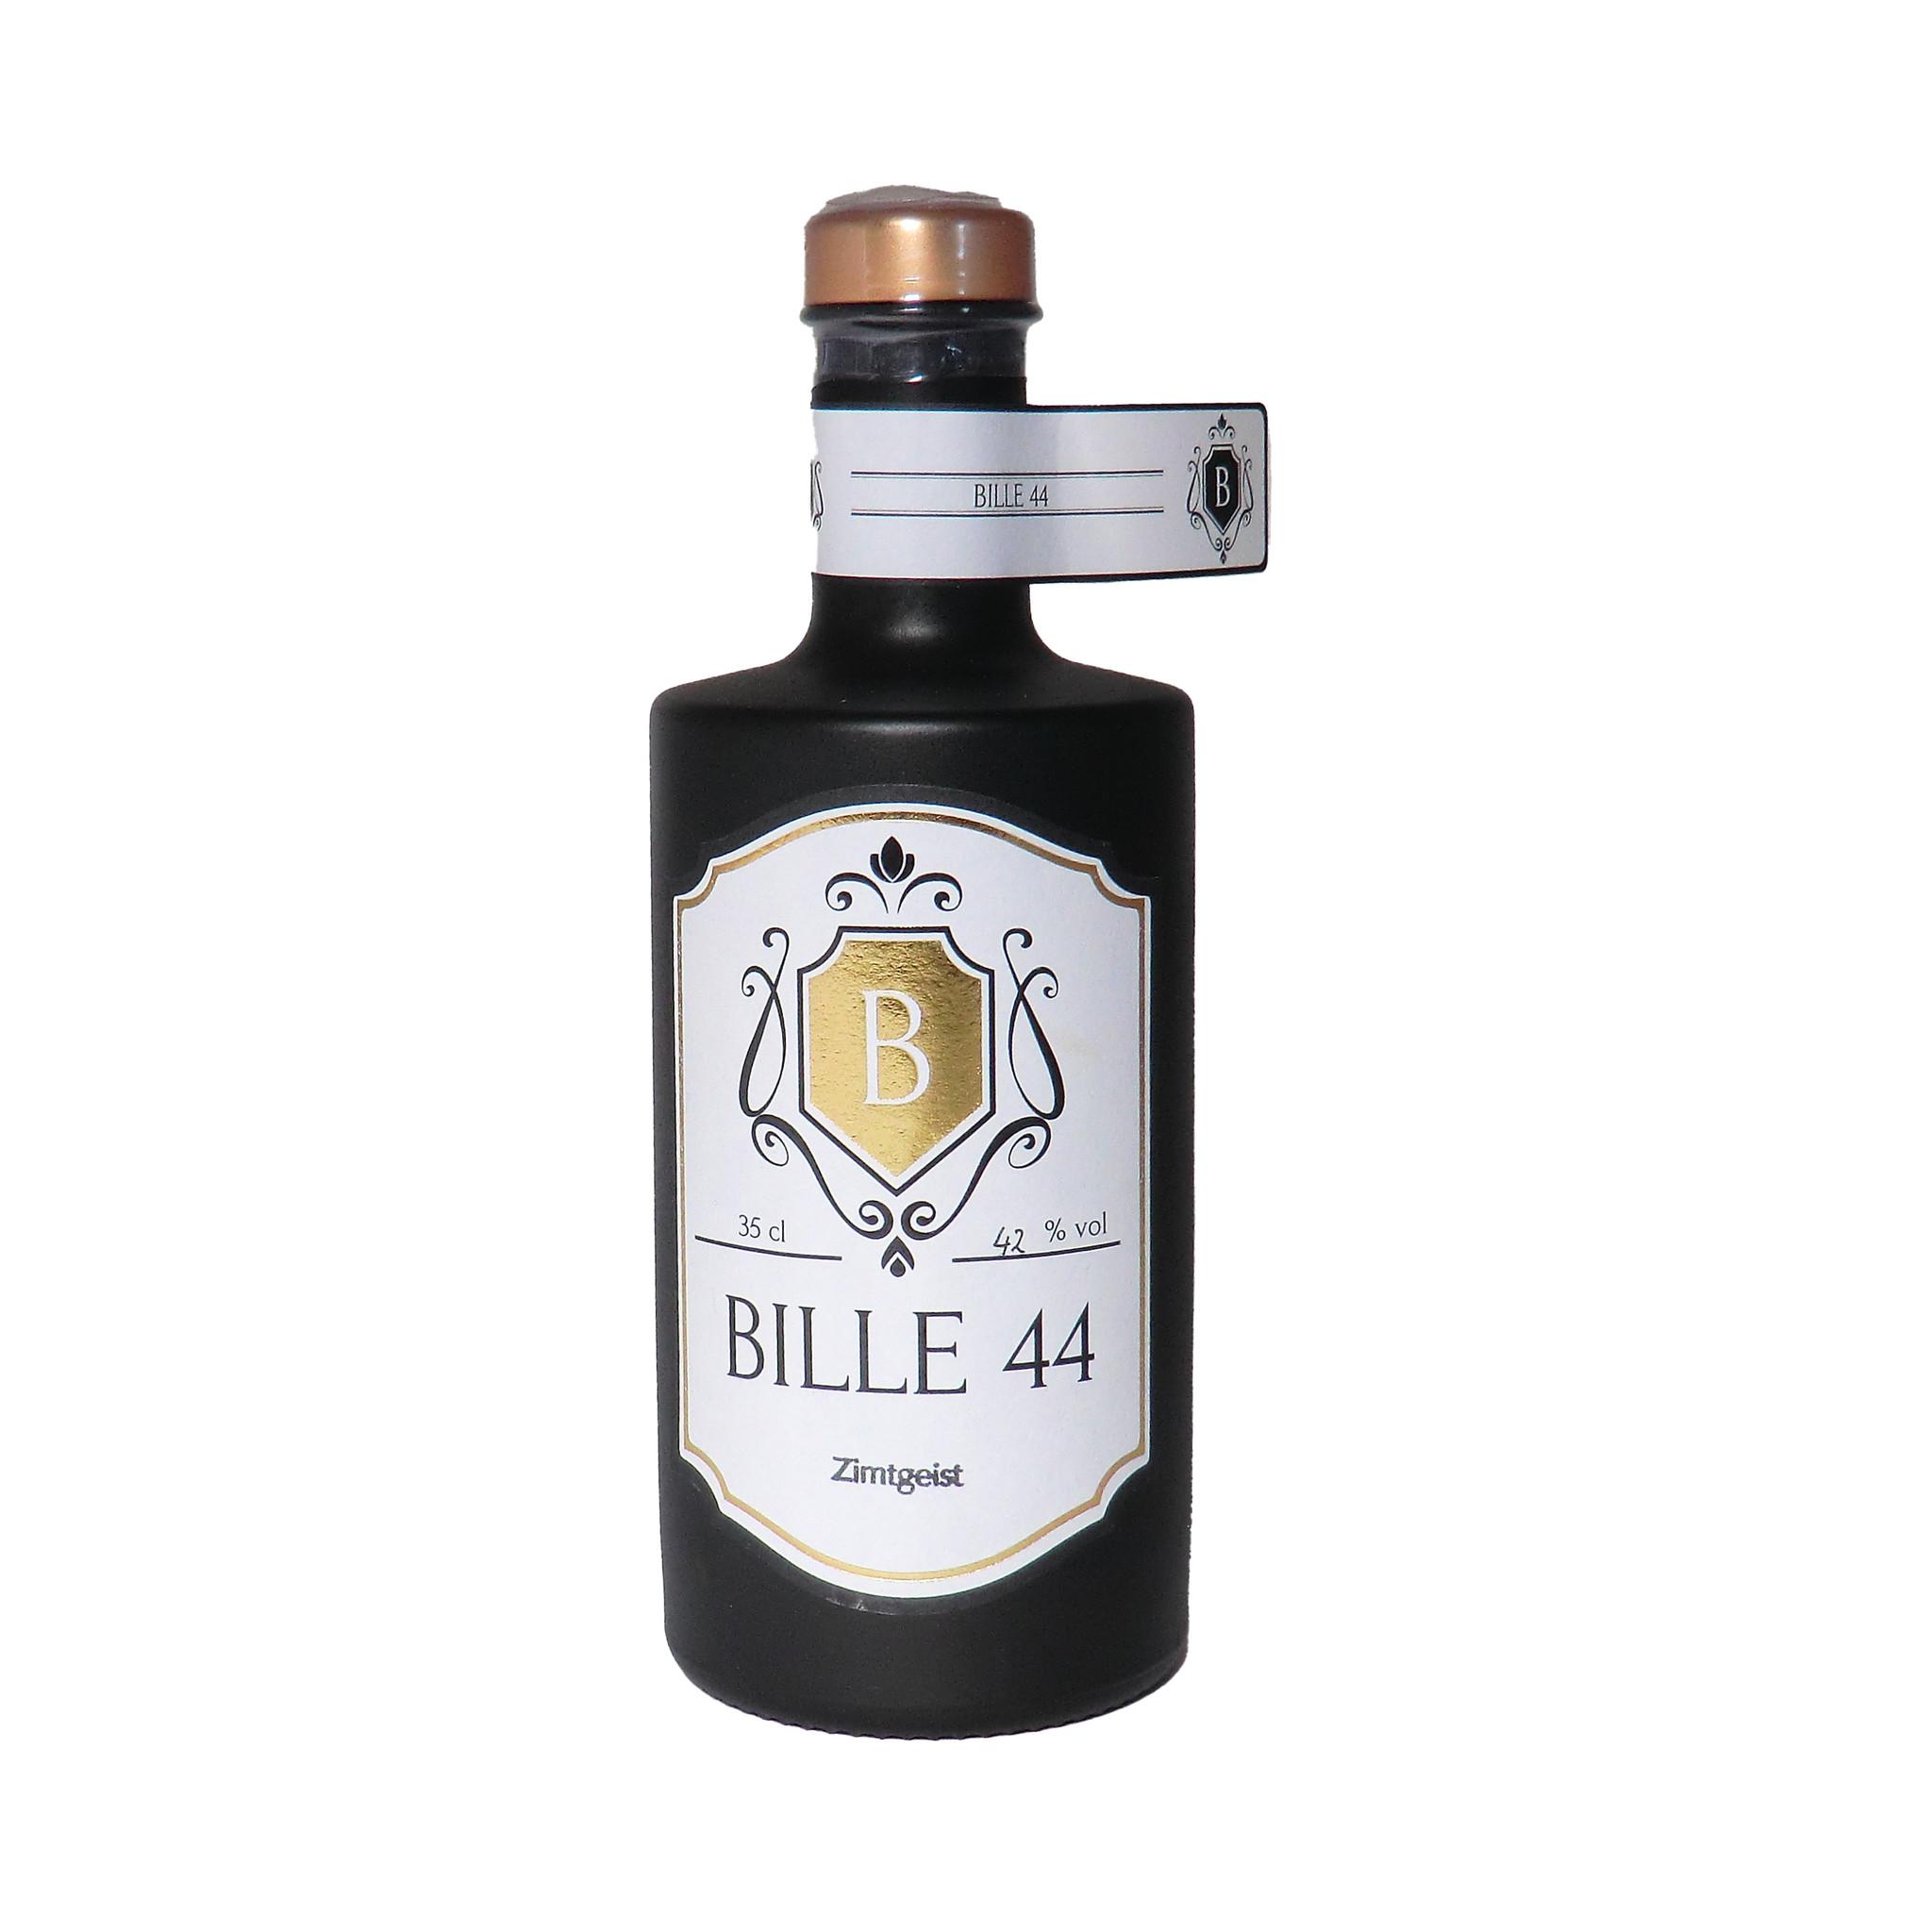 Bille44 - Premium Edelbrand Zimtgeist 350ml